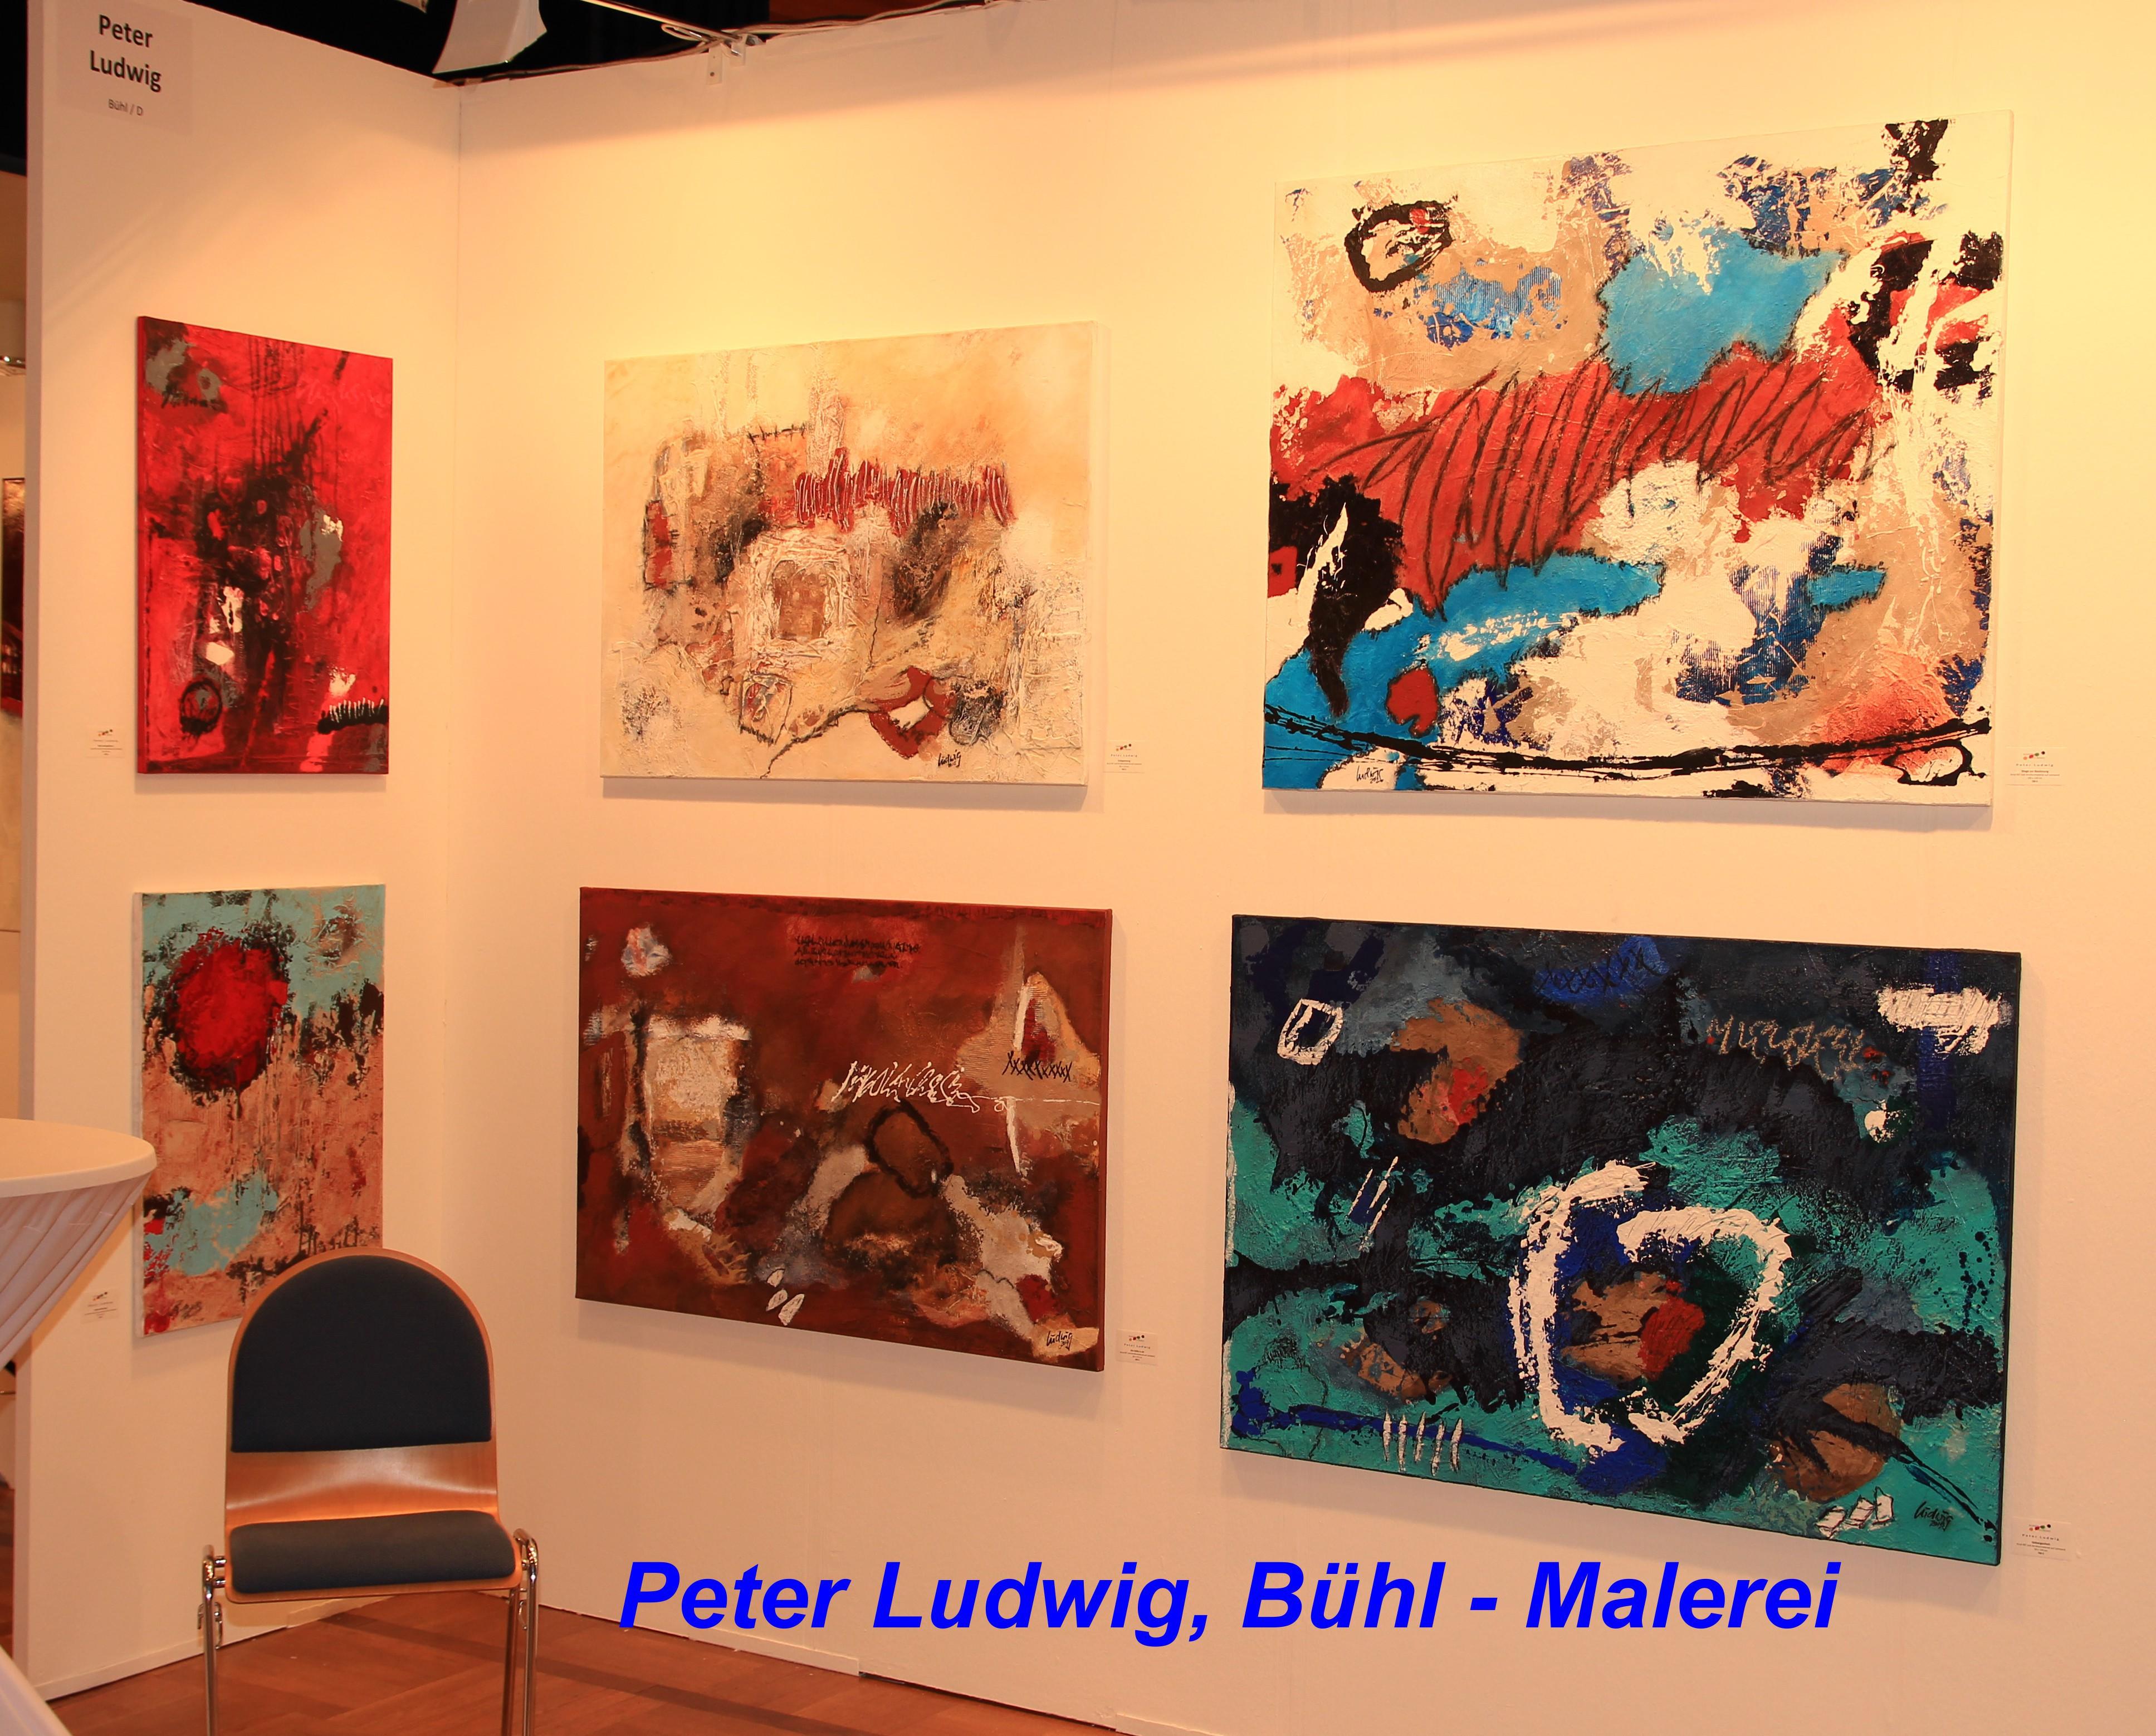 Peter Ludwig, Bühl - Malerei